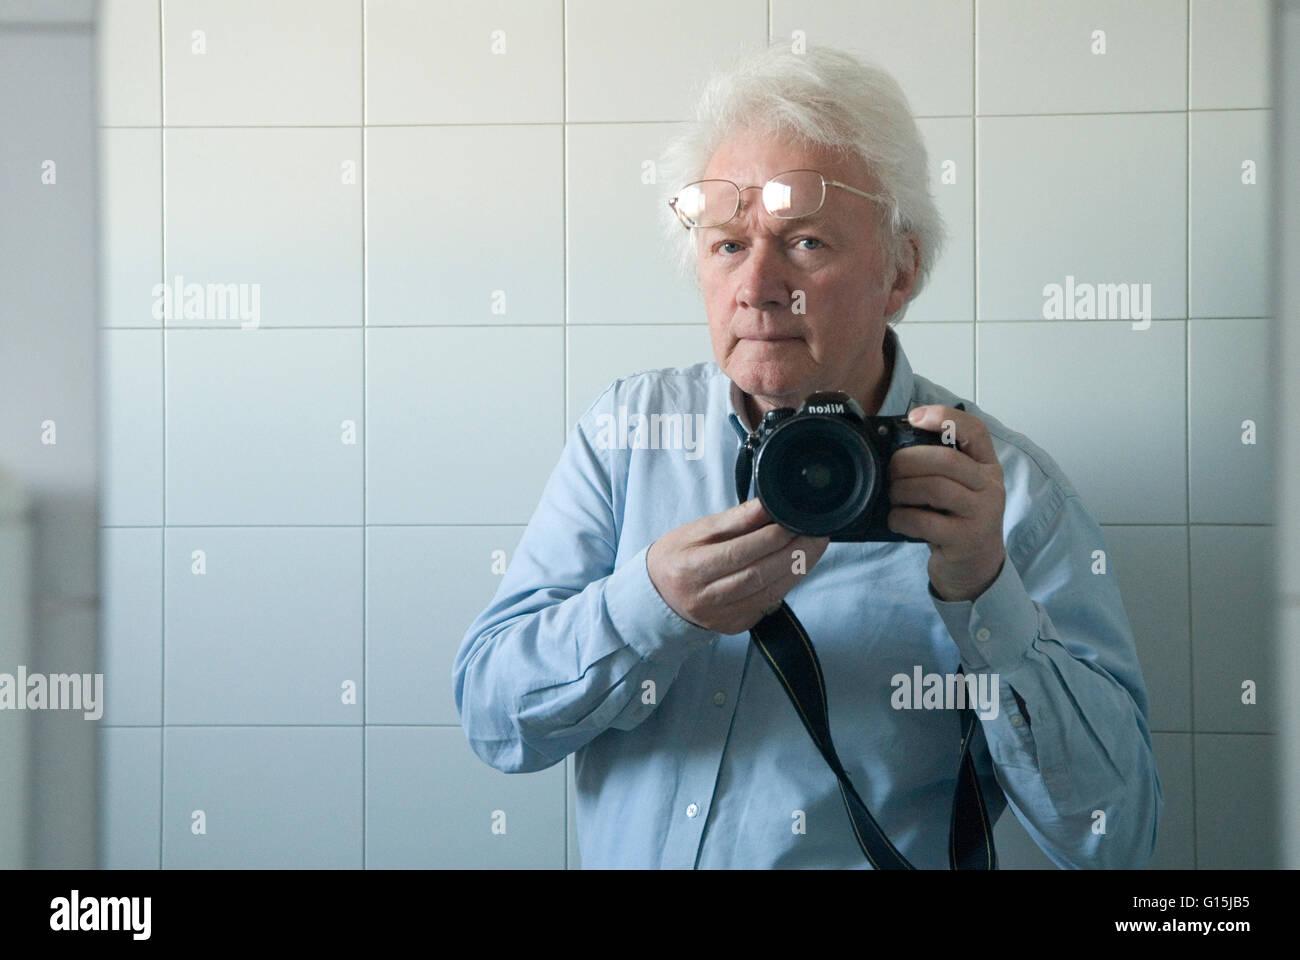 Homer Sykes photographer 2016 self portrait - Stock Image